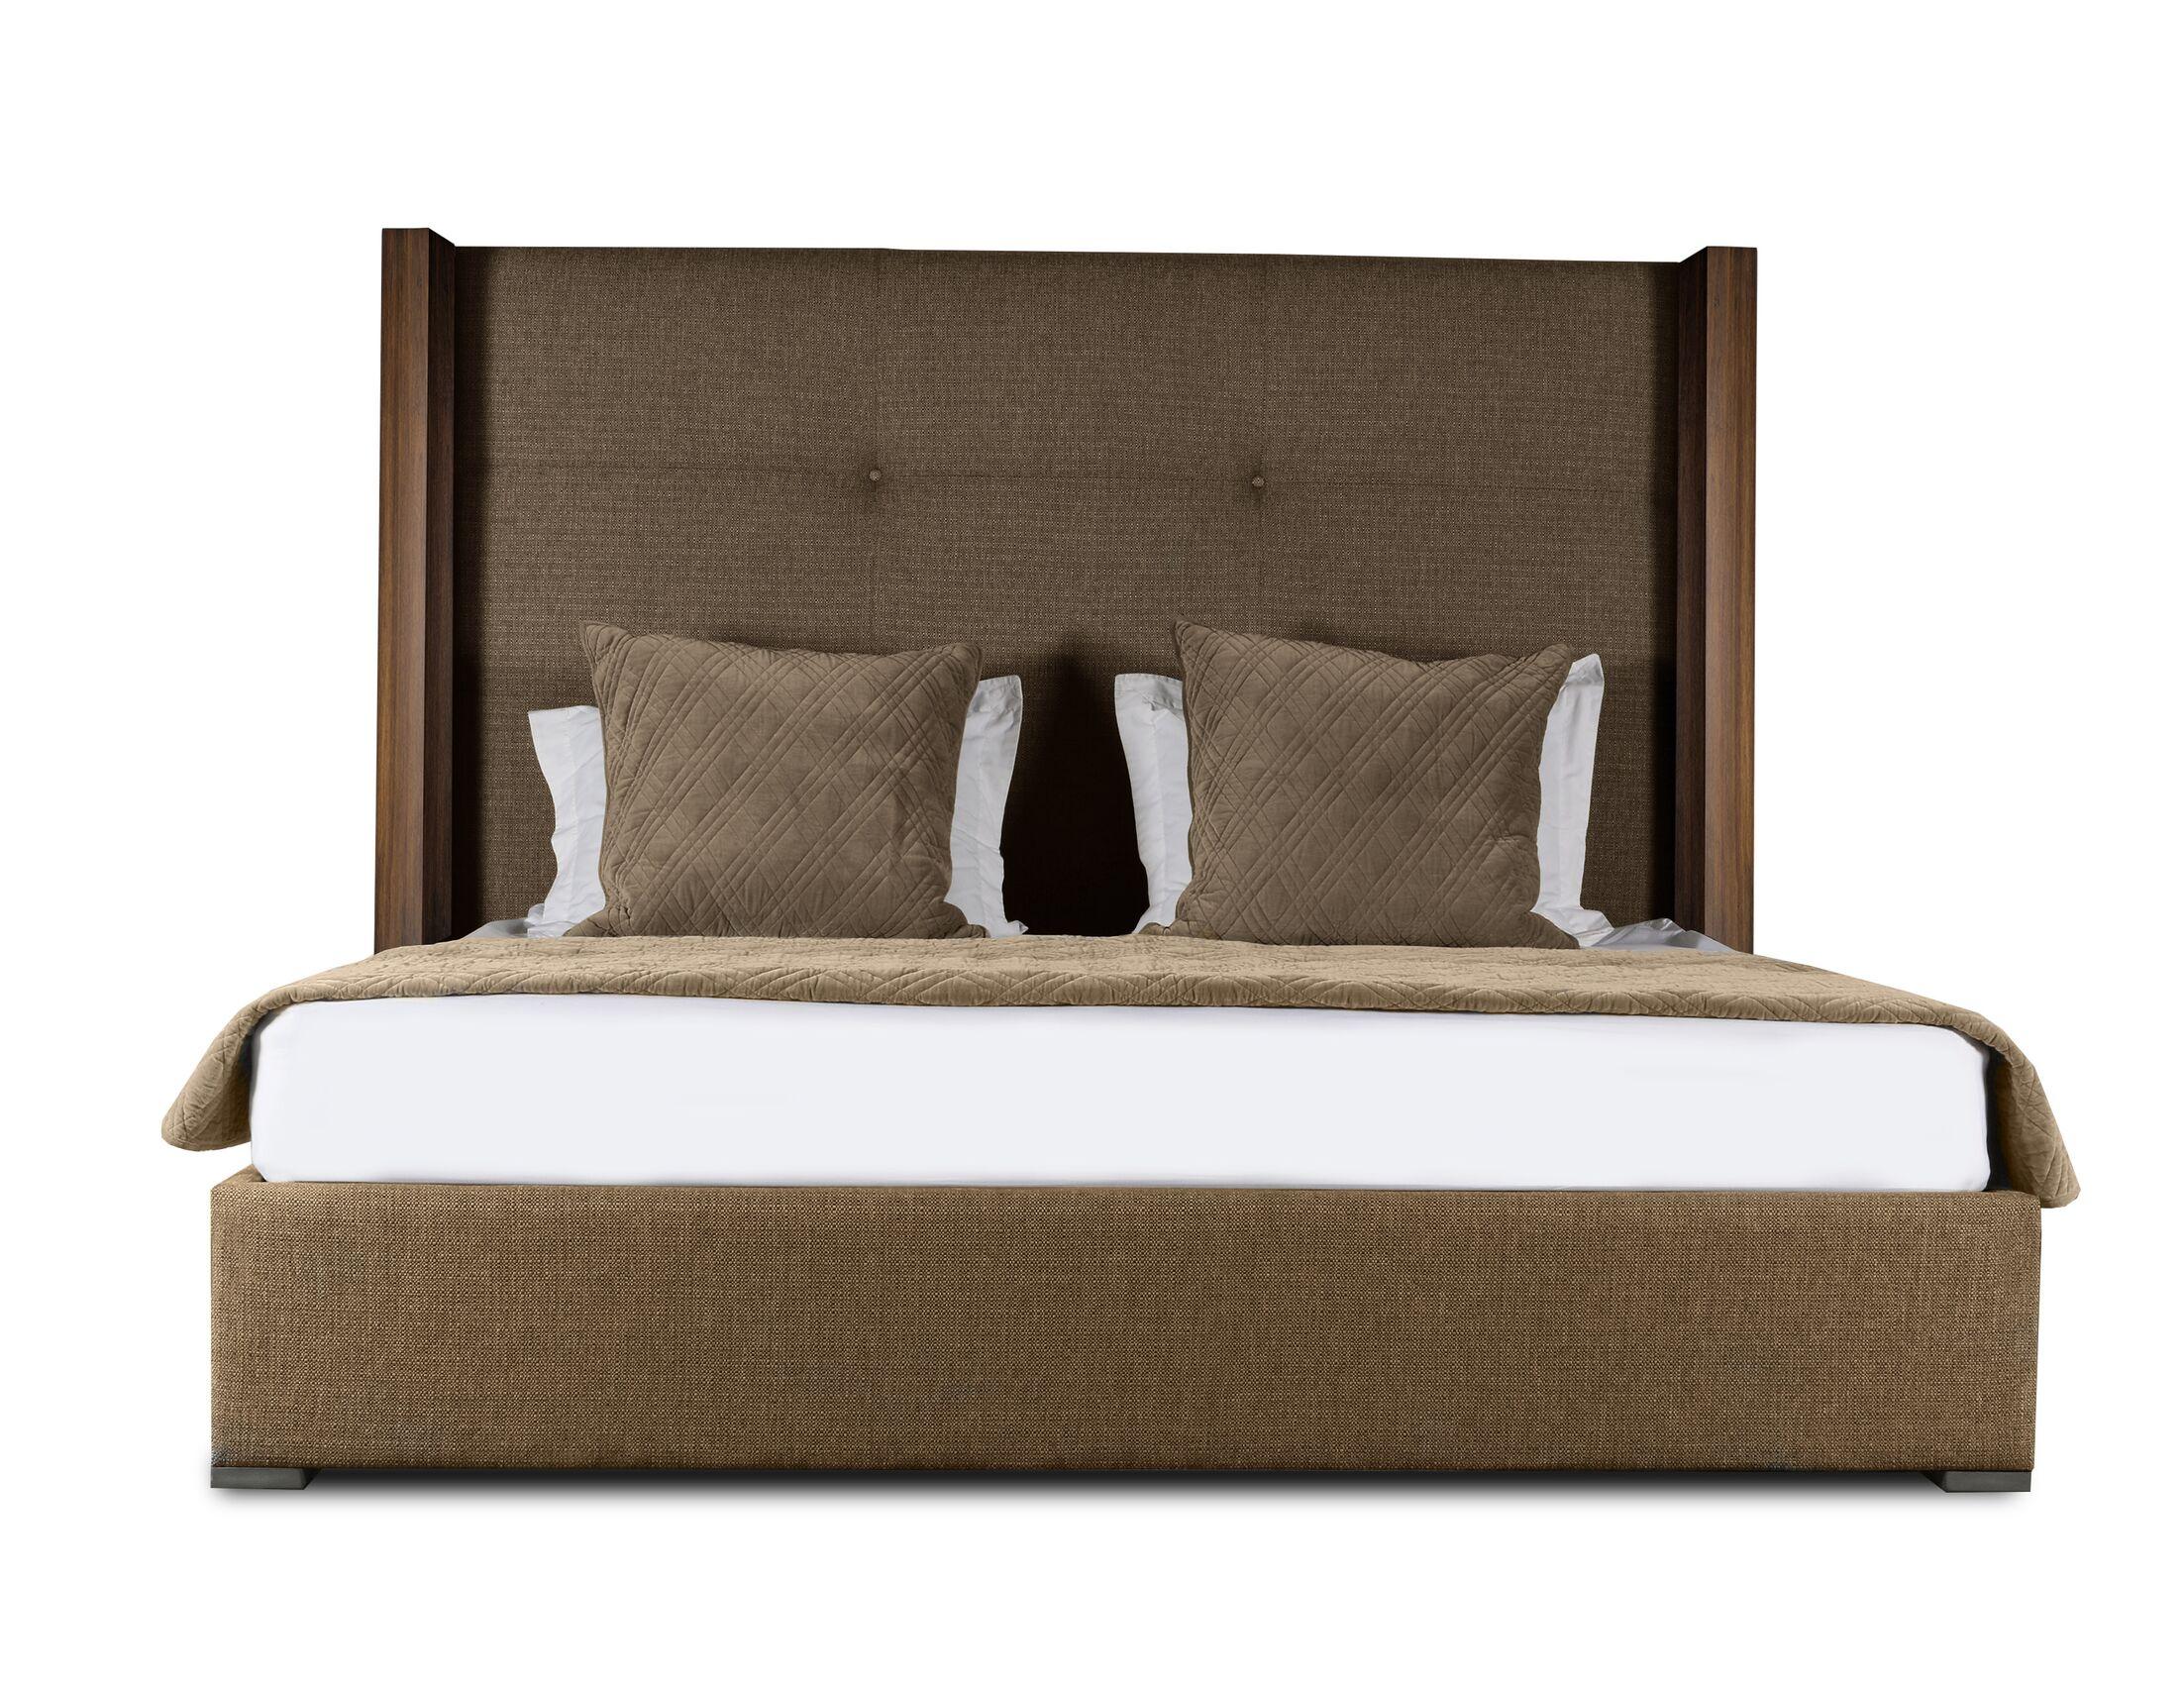 Harborcreek Upholstered Platform Bed Color: Brown, Size: Mid Height California King